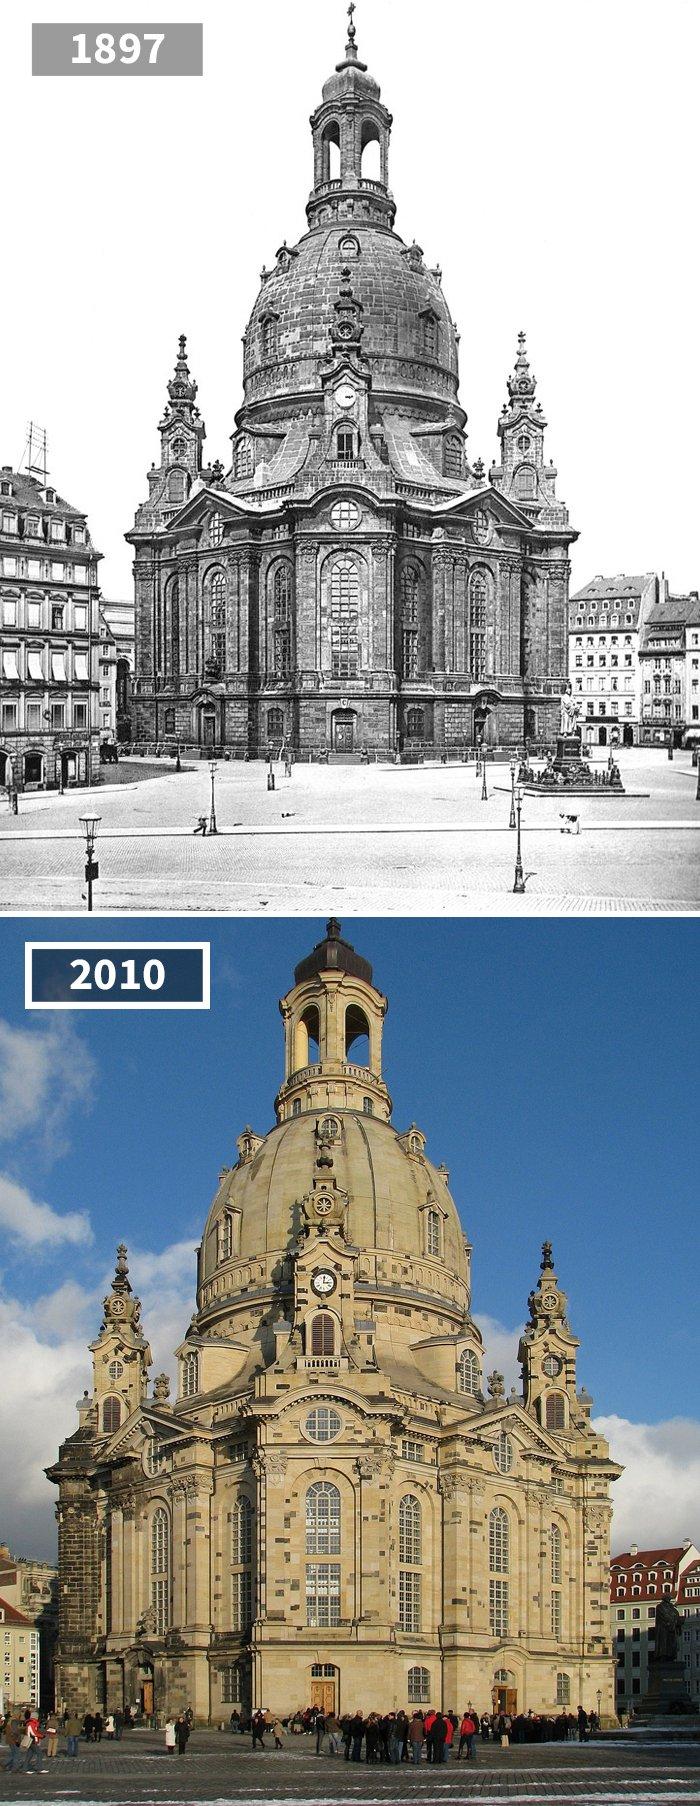 Église Notre-Dame de Dresde, Dresde, Allemagne, 1897 - 2010